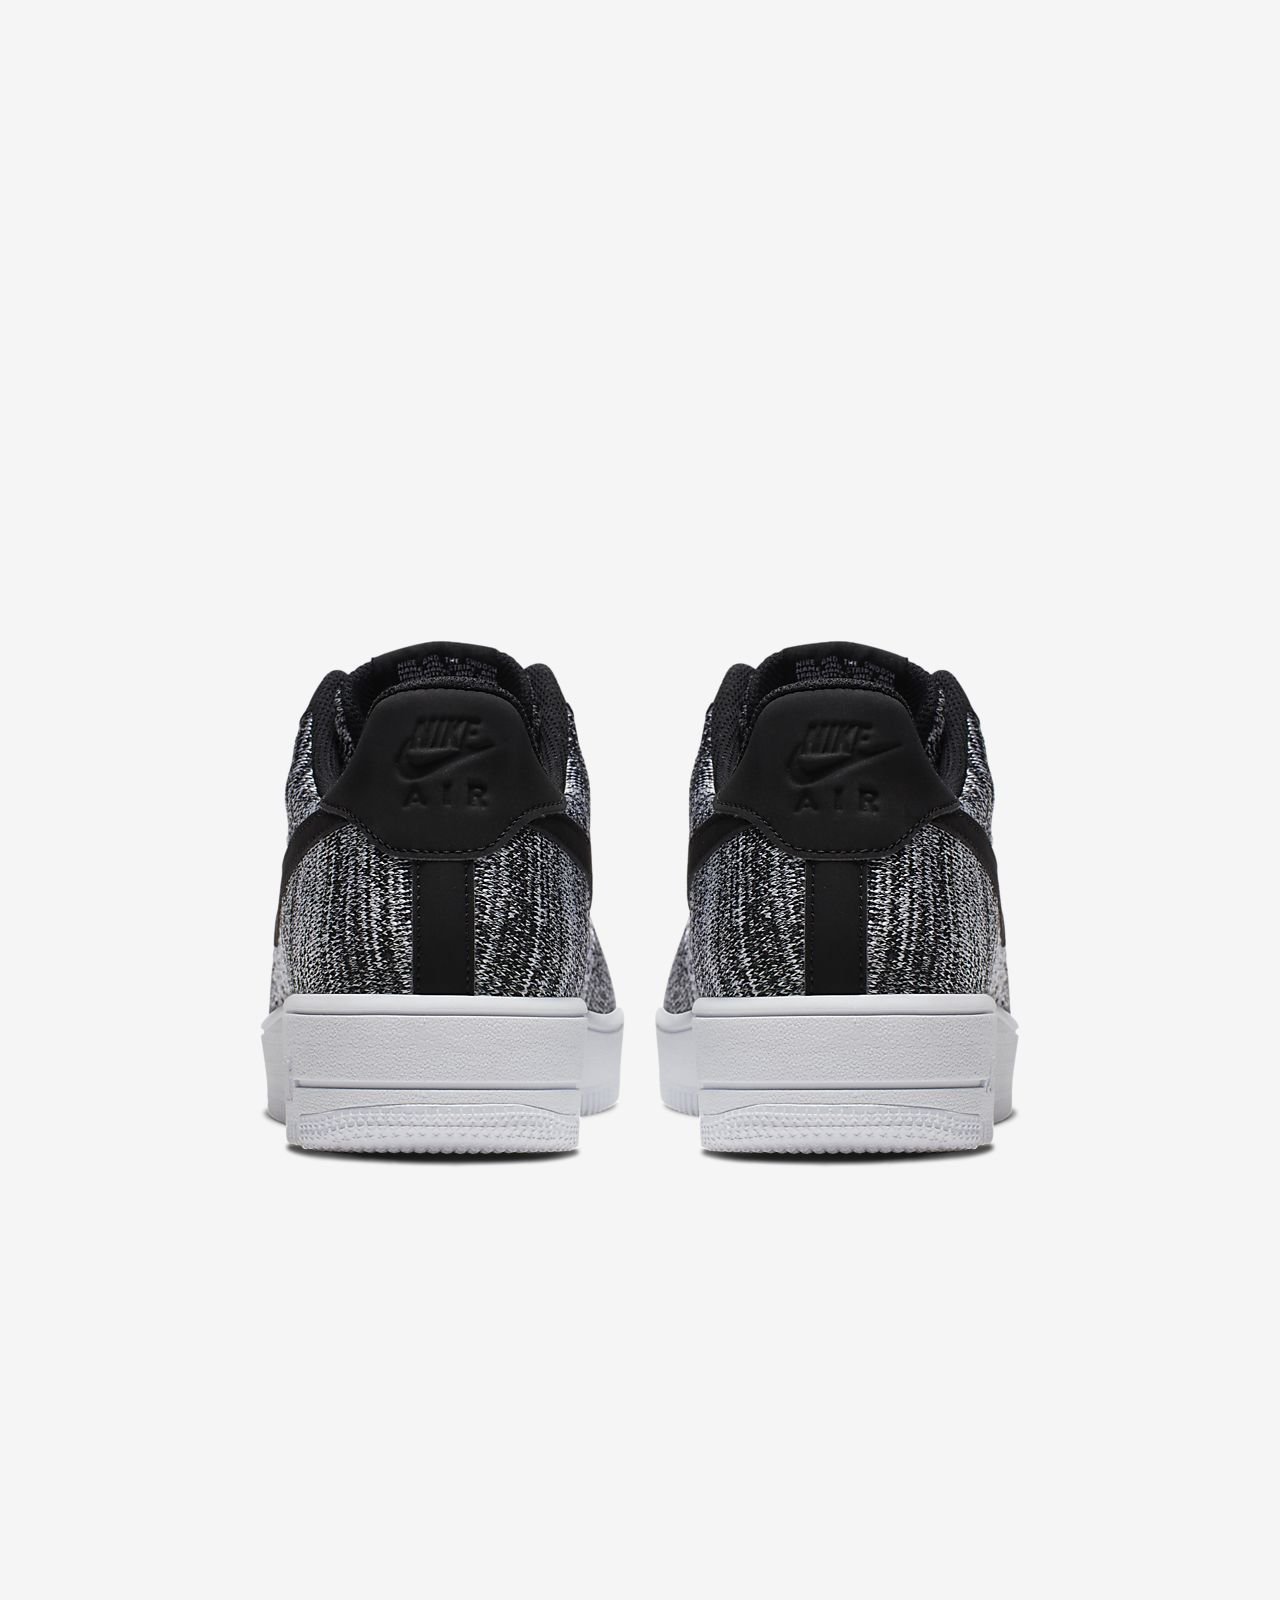 Nike Air Force 1 Flyknit 2.0 Shoe. Nike GB